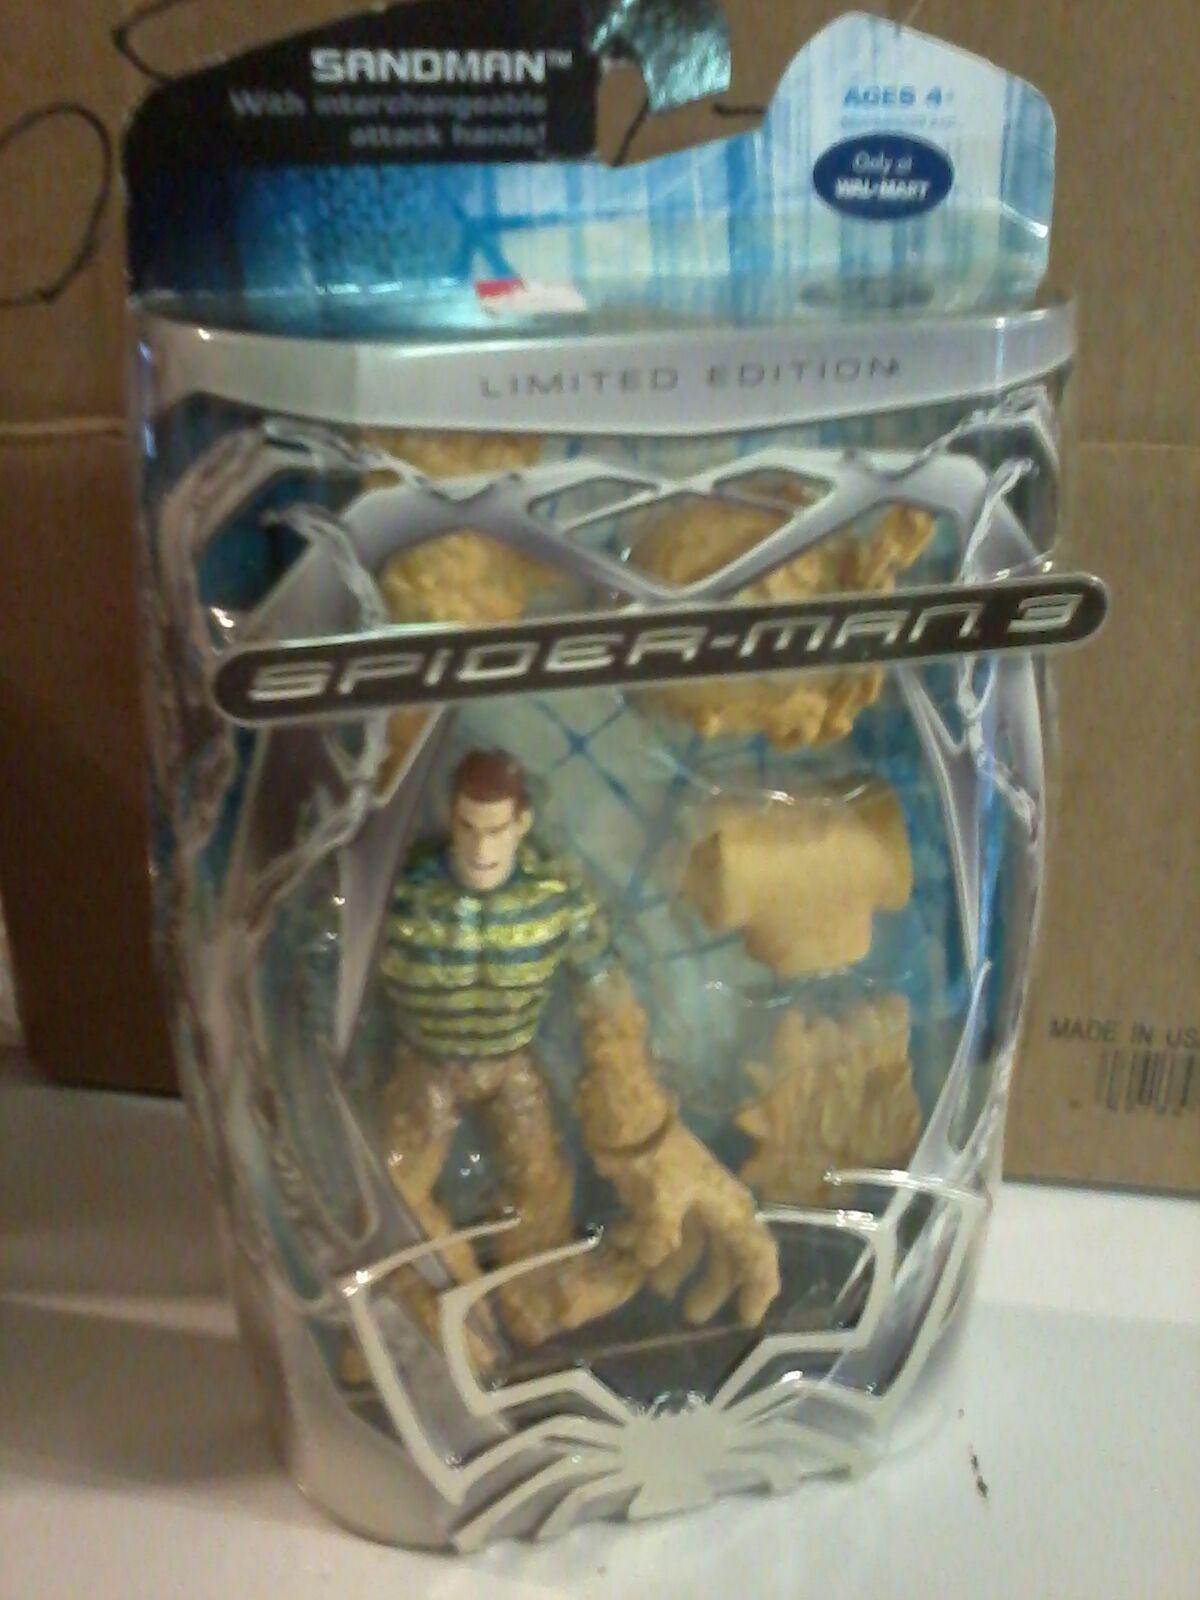 2007 Marvel Walmart Exclusive Spider-Man 3 Sandman Limited Edition Figure (New)